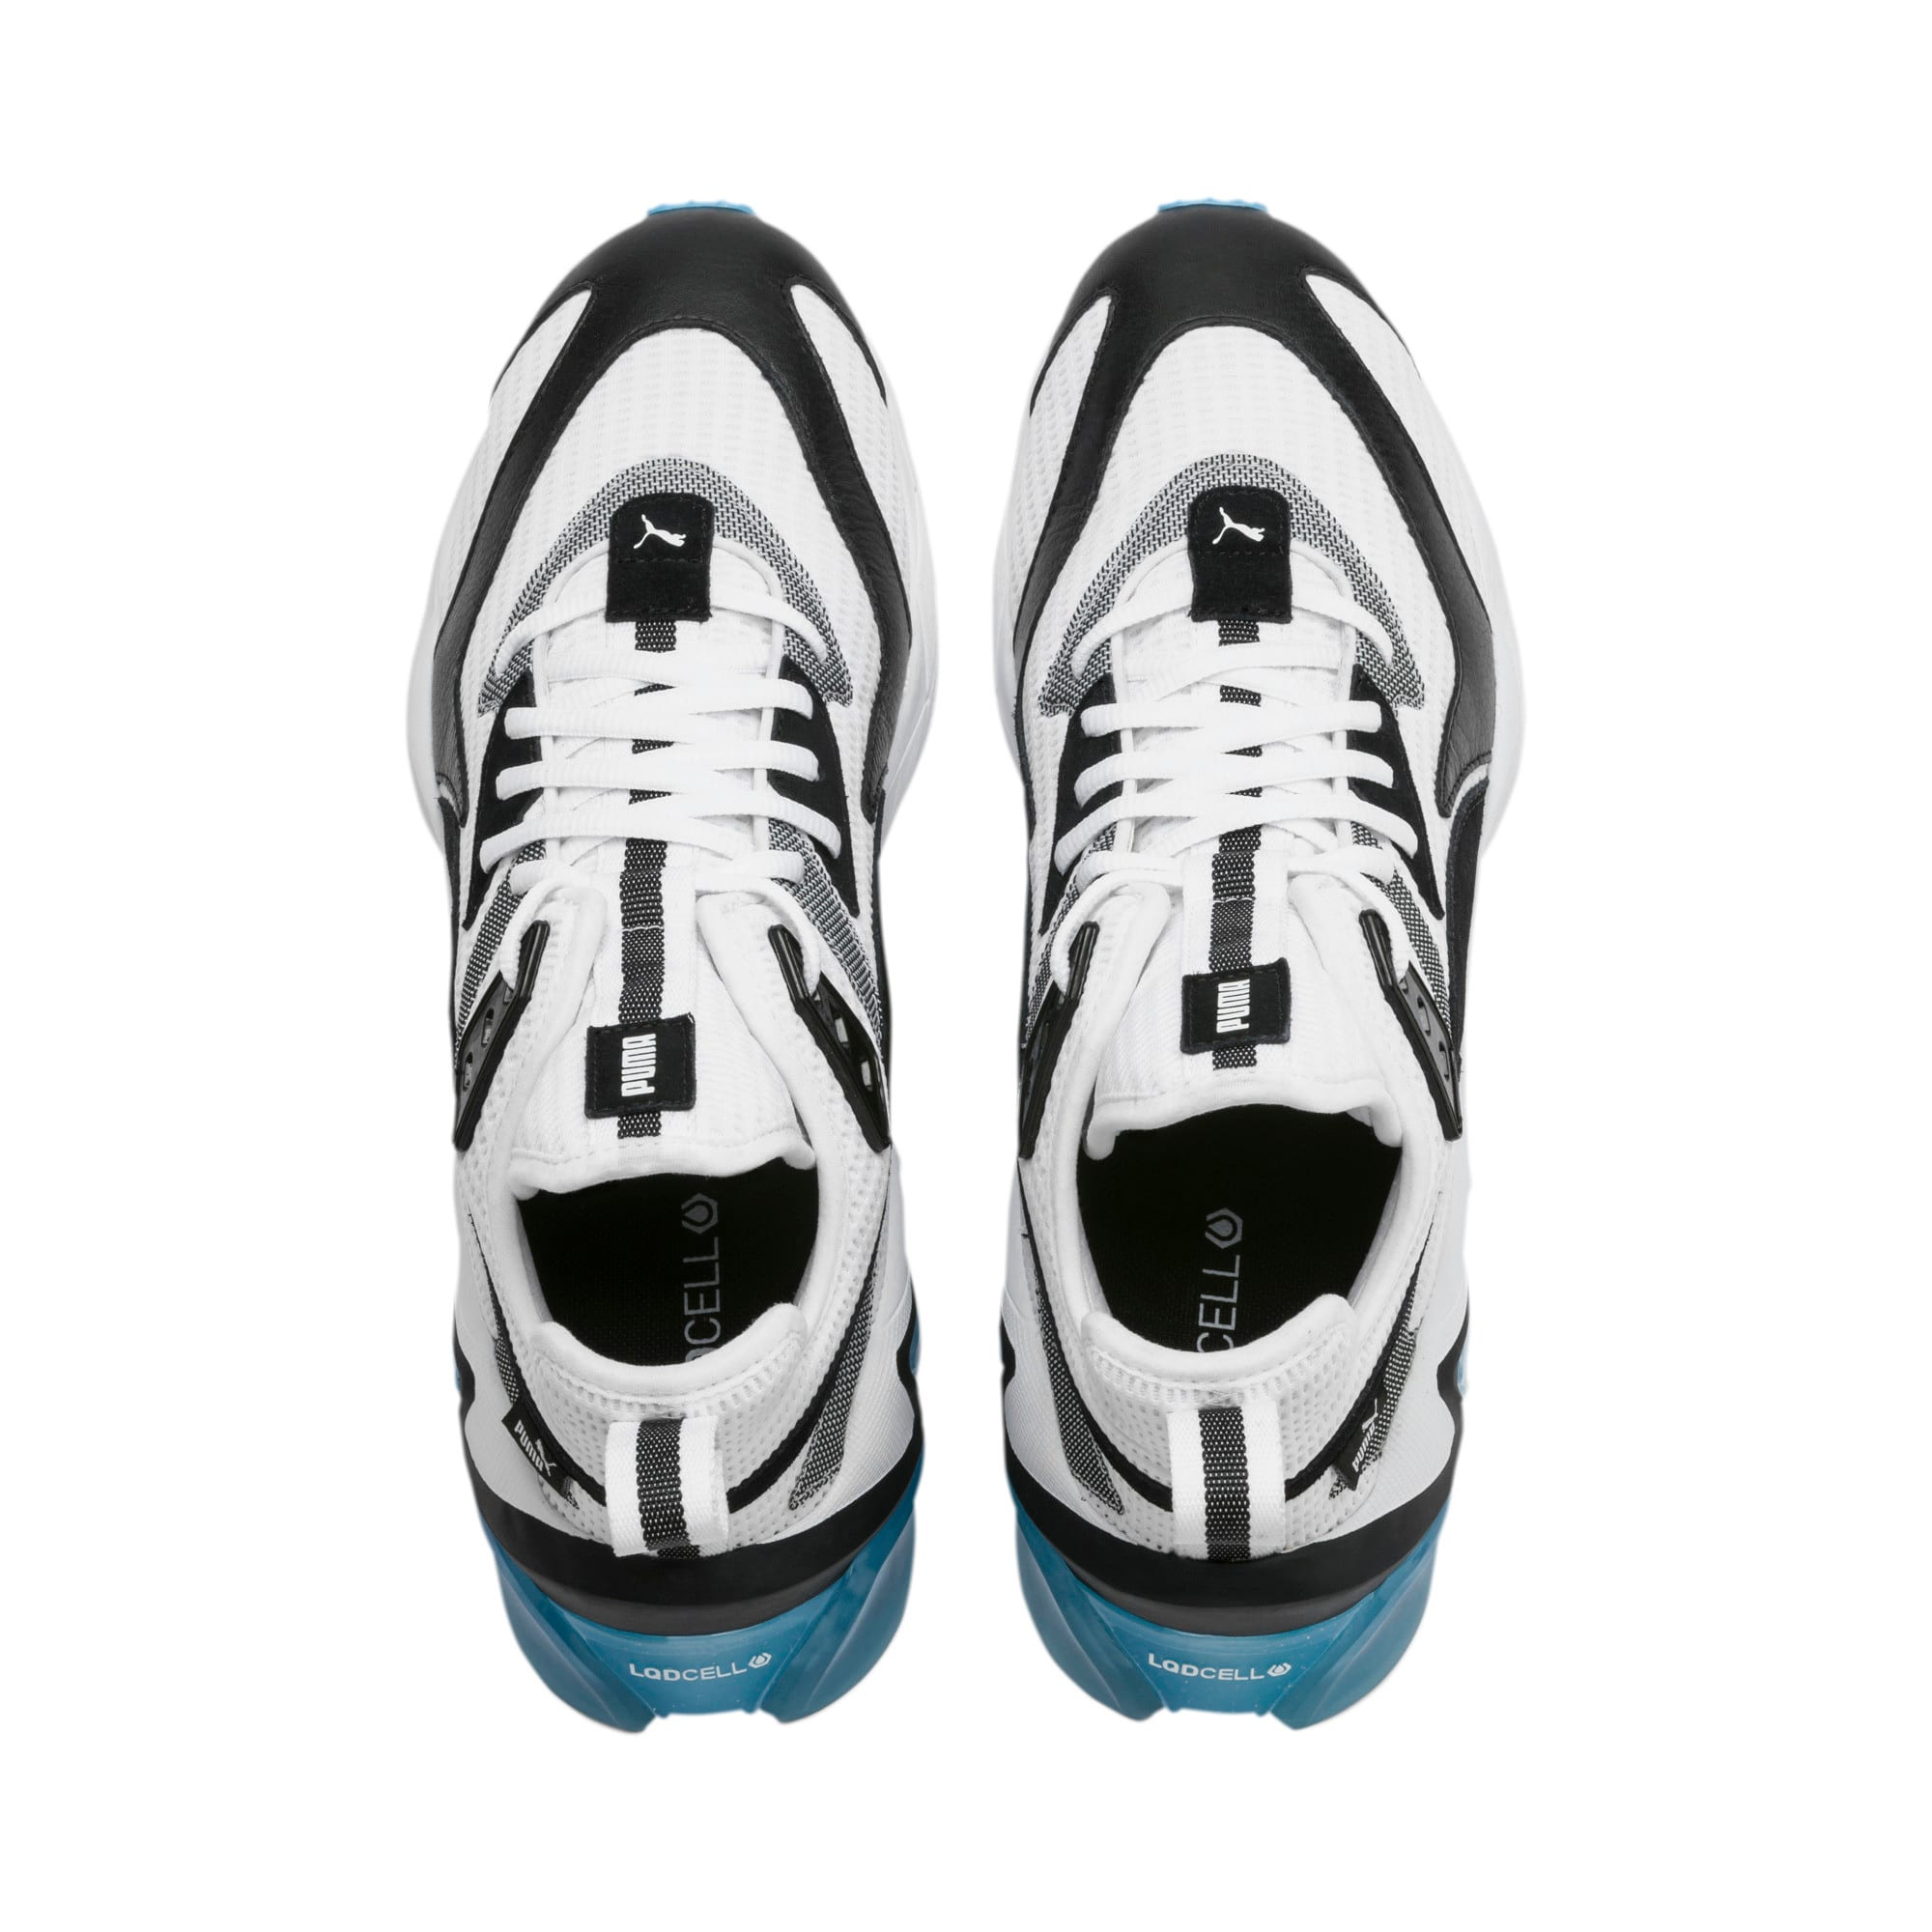 Anteprima 7 di LQDCELL Origin Men's Shoes, Puma White-Puma Black, medio